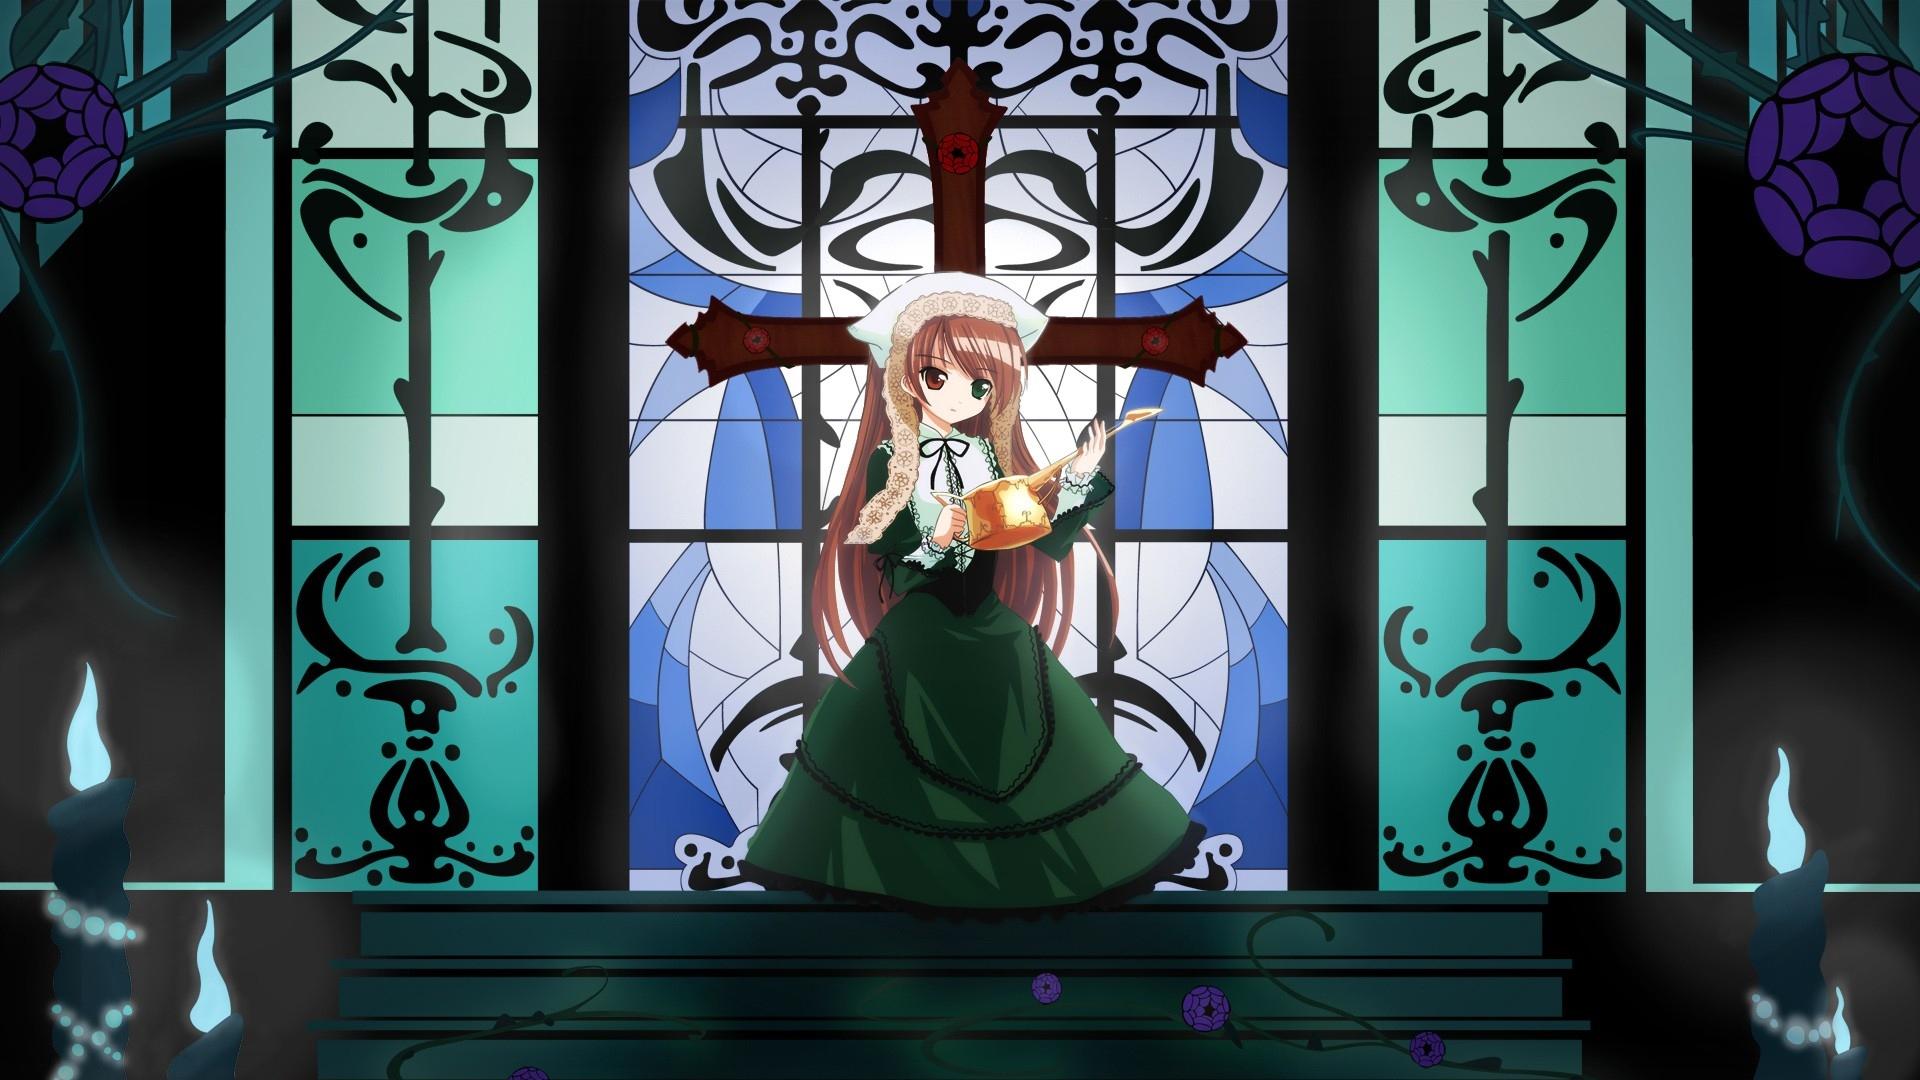 anime girl, ?inderella, cross